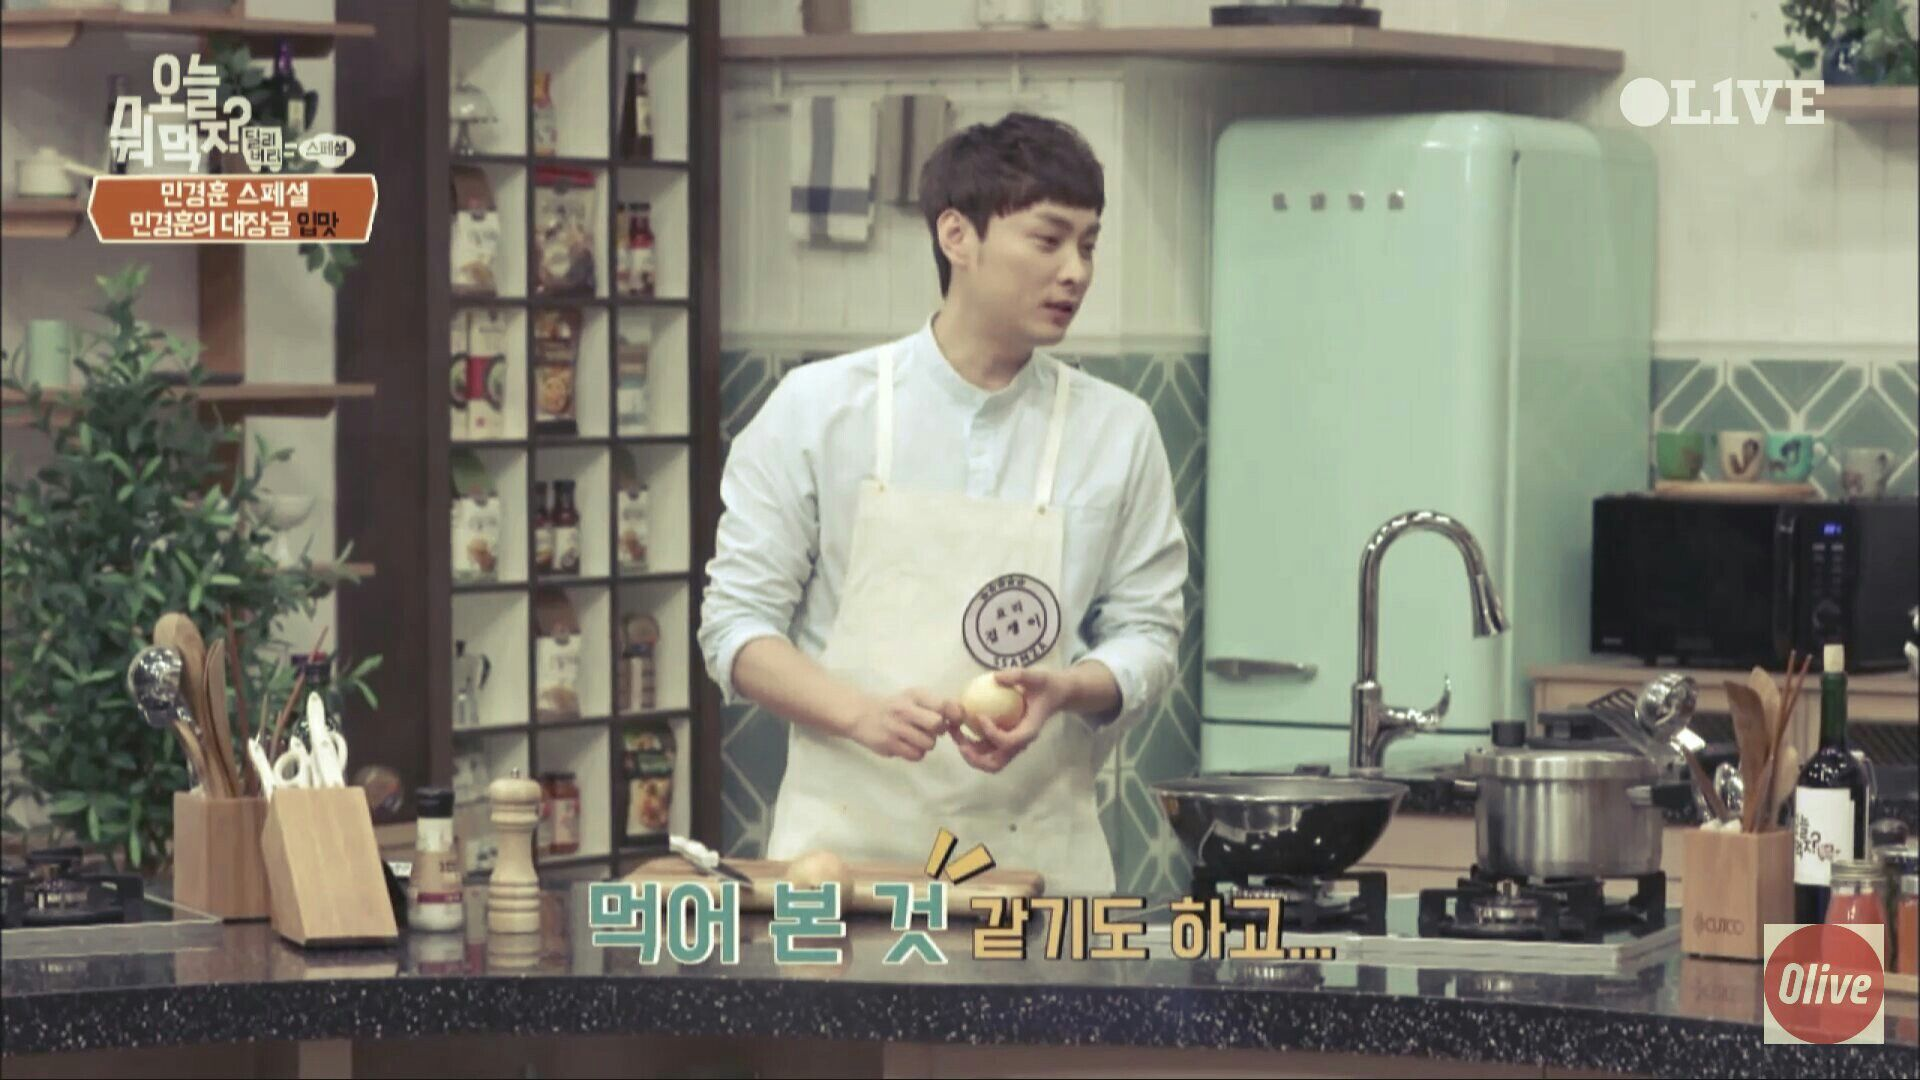 Minkyunghoon Kyunghoon Knowingbrother Kb Korea Koreanman Buzz Cooking Handsome Kimheechul Superjunior Kpop Idol Kim Heechul Super Junior Kpop